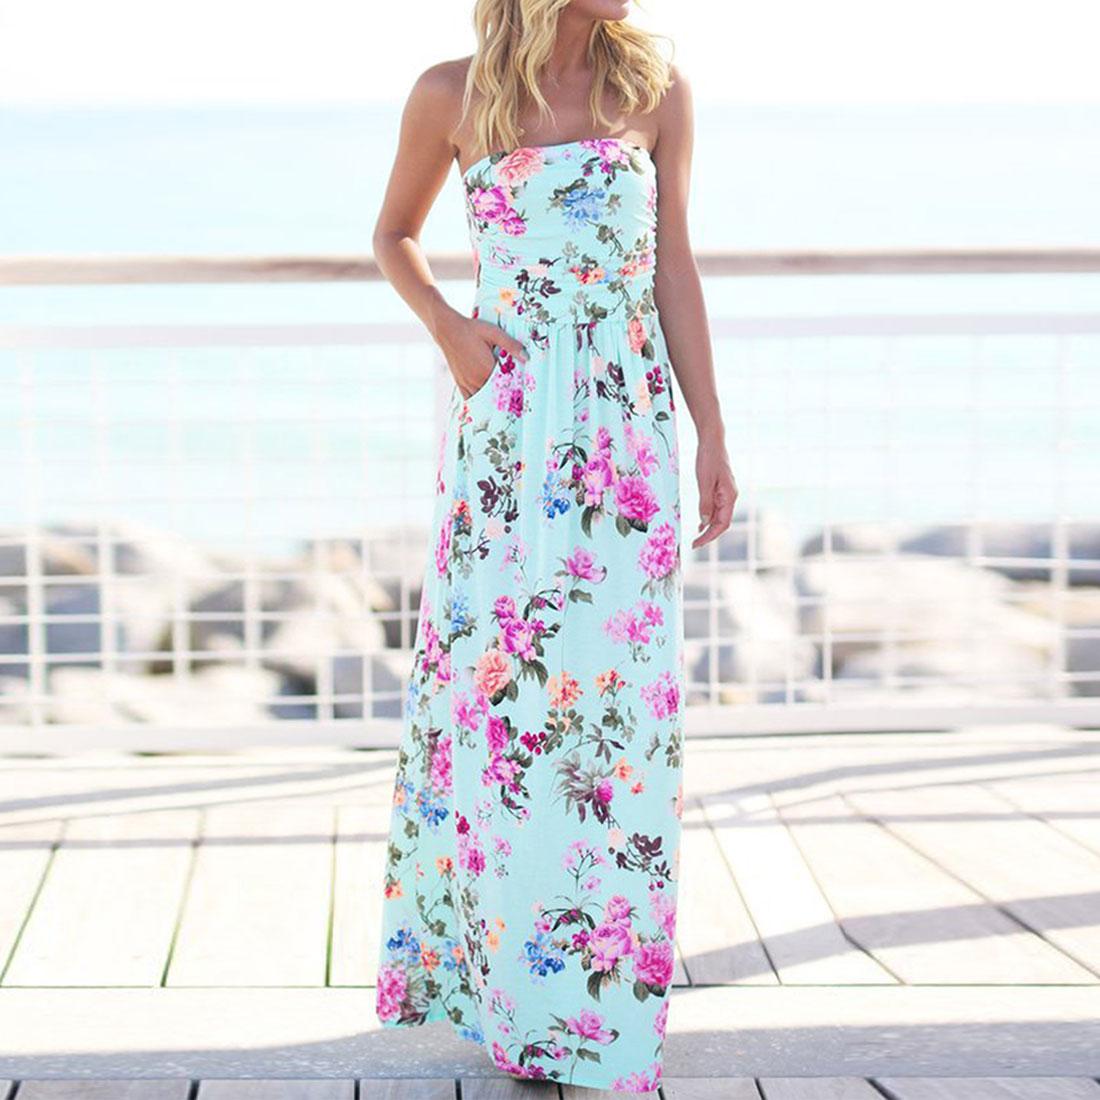 ee70d862d2718 Charming Women Fashion Summer Beach Bohemian Boho Long Dress Strapless  Shoulder Off Floral Printed Maxi Dress Black